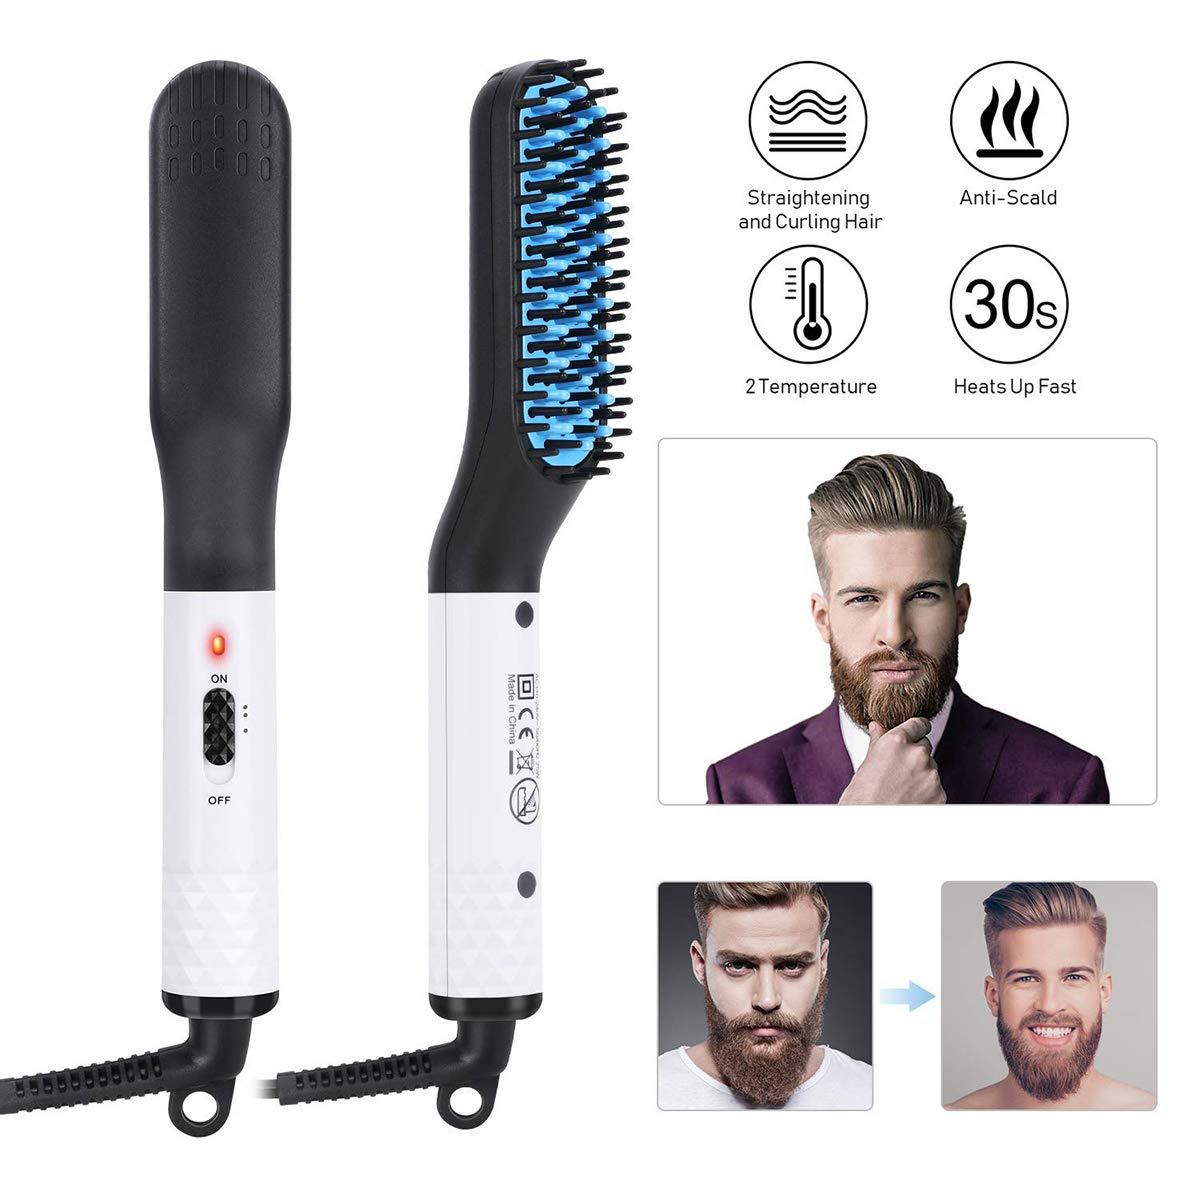 Beard Straightener Brush, Mens Hair Straightener Brush Multifunctional Quick Curly Hair Straightening Comb Side Hair Detangling Styling Electric Hair Comb